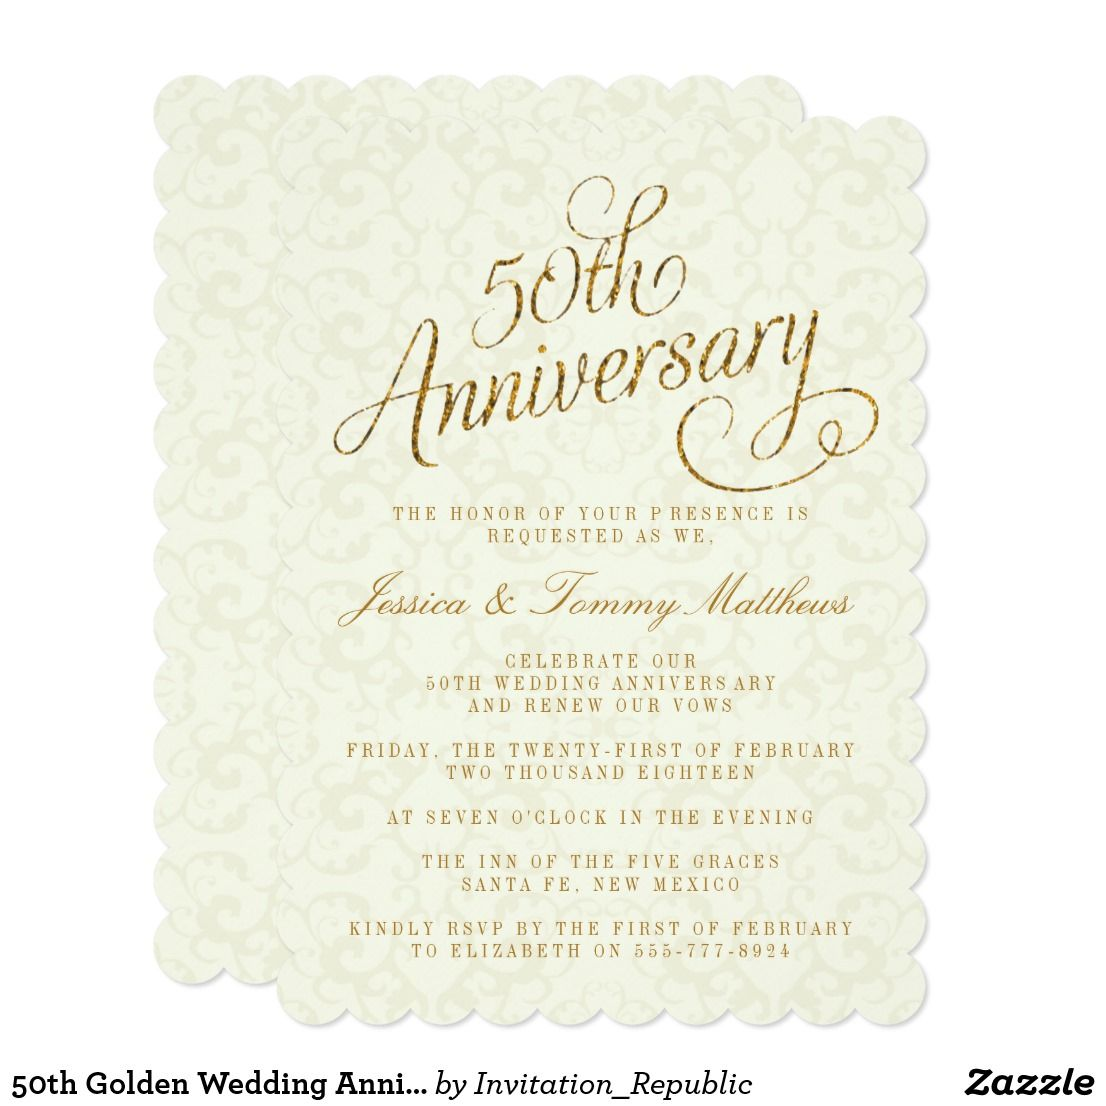 50th Golden Wedding Anniversary Invitations | Pinterest | Golden ...